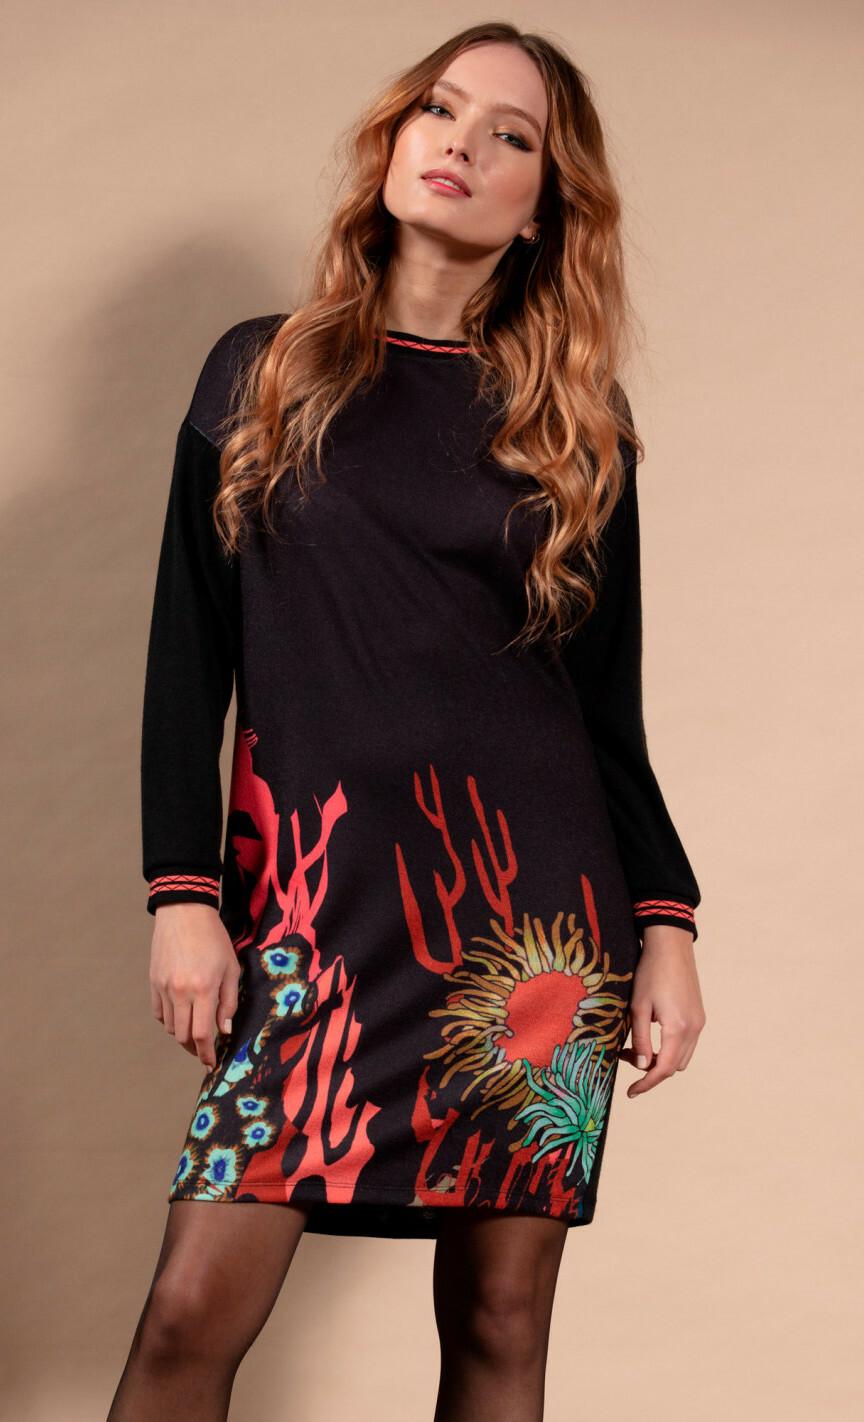 Maloka: Sedona Rock Abstract Art Sweater Dress MK_ERINA